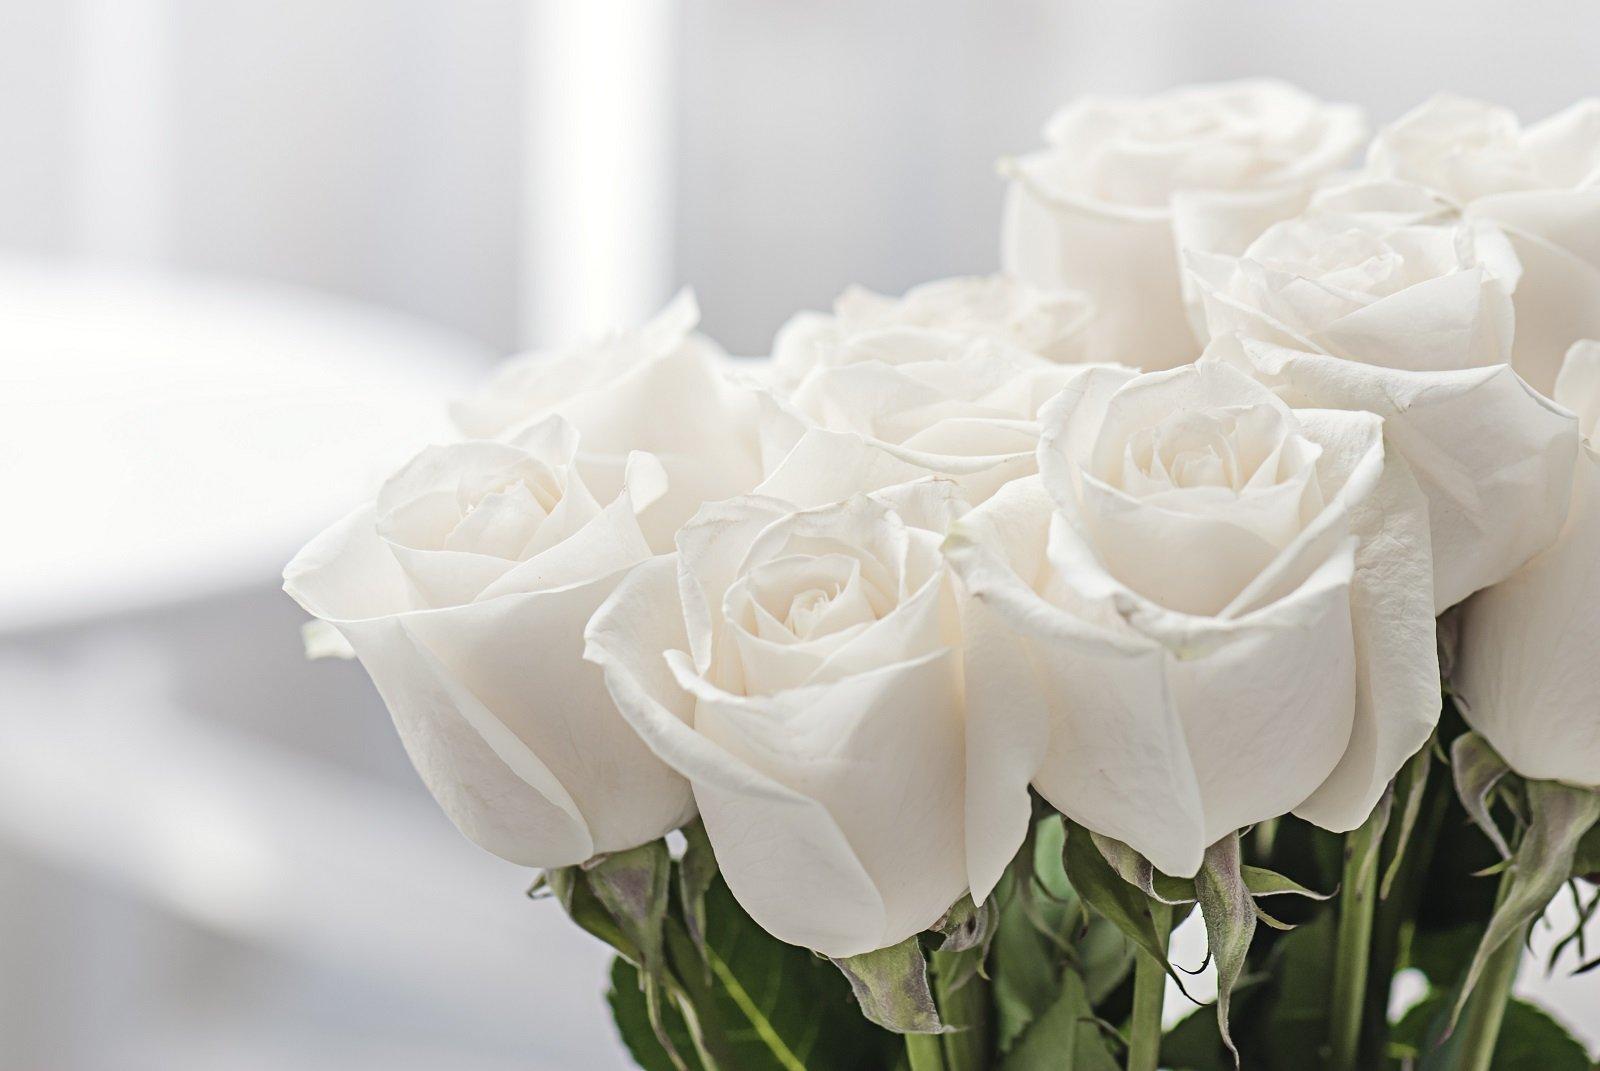 delle rose bianche